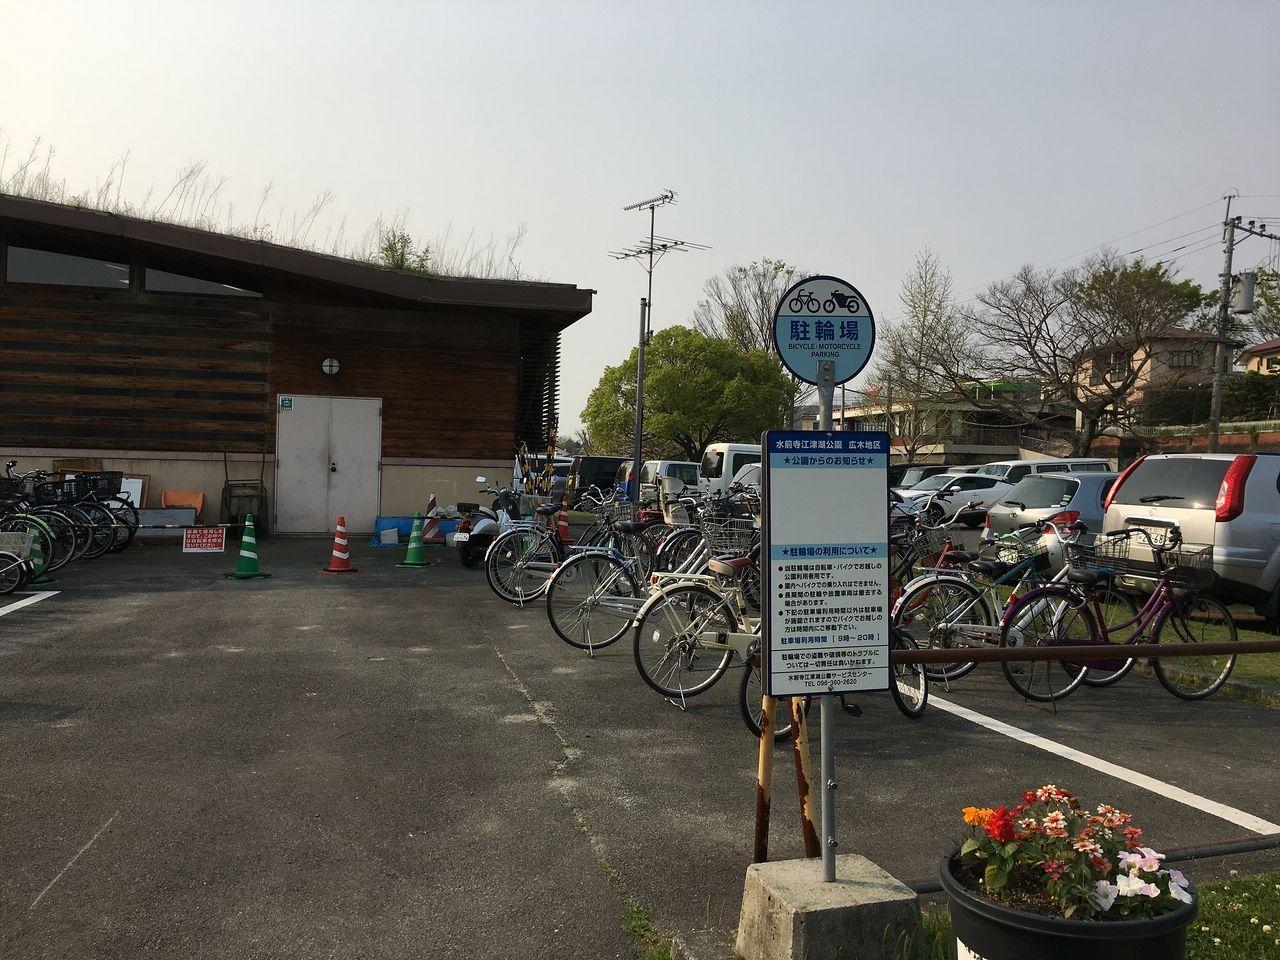 熊本市東区の水前寺江津湖公園・広木地区の駐輪場